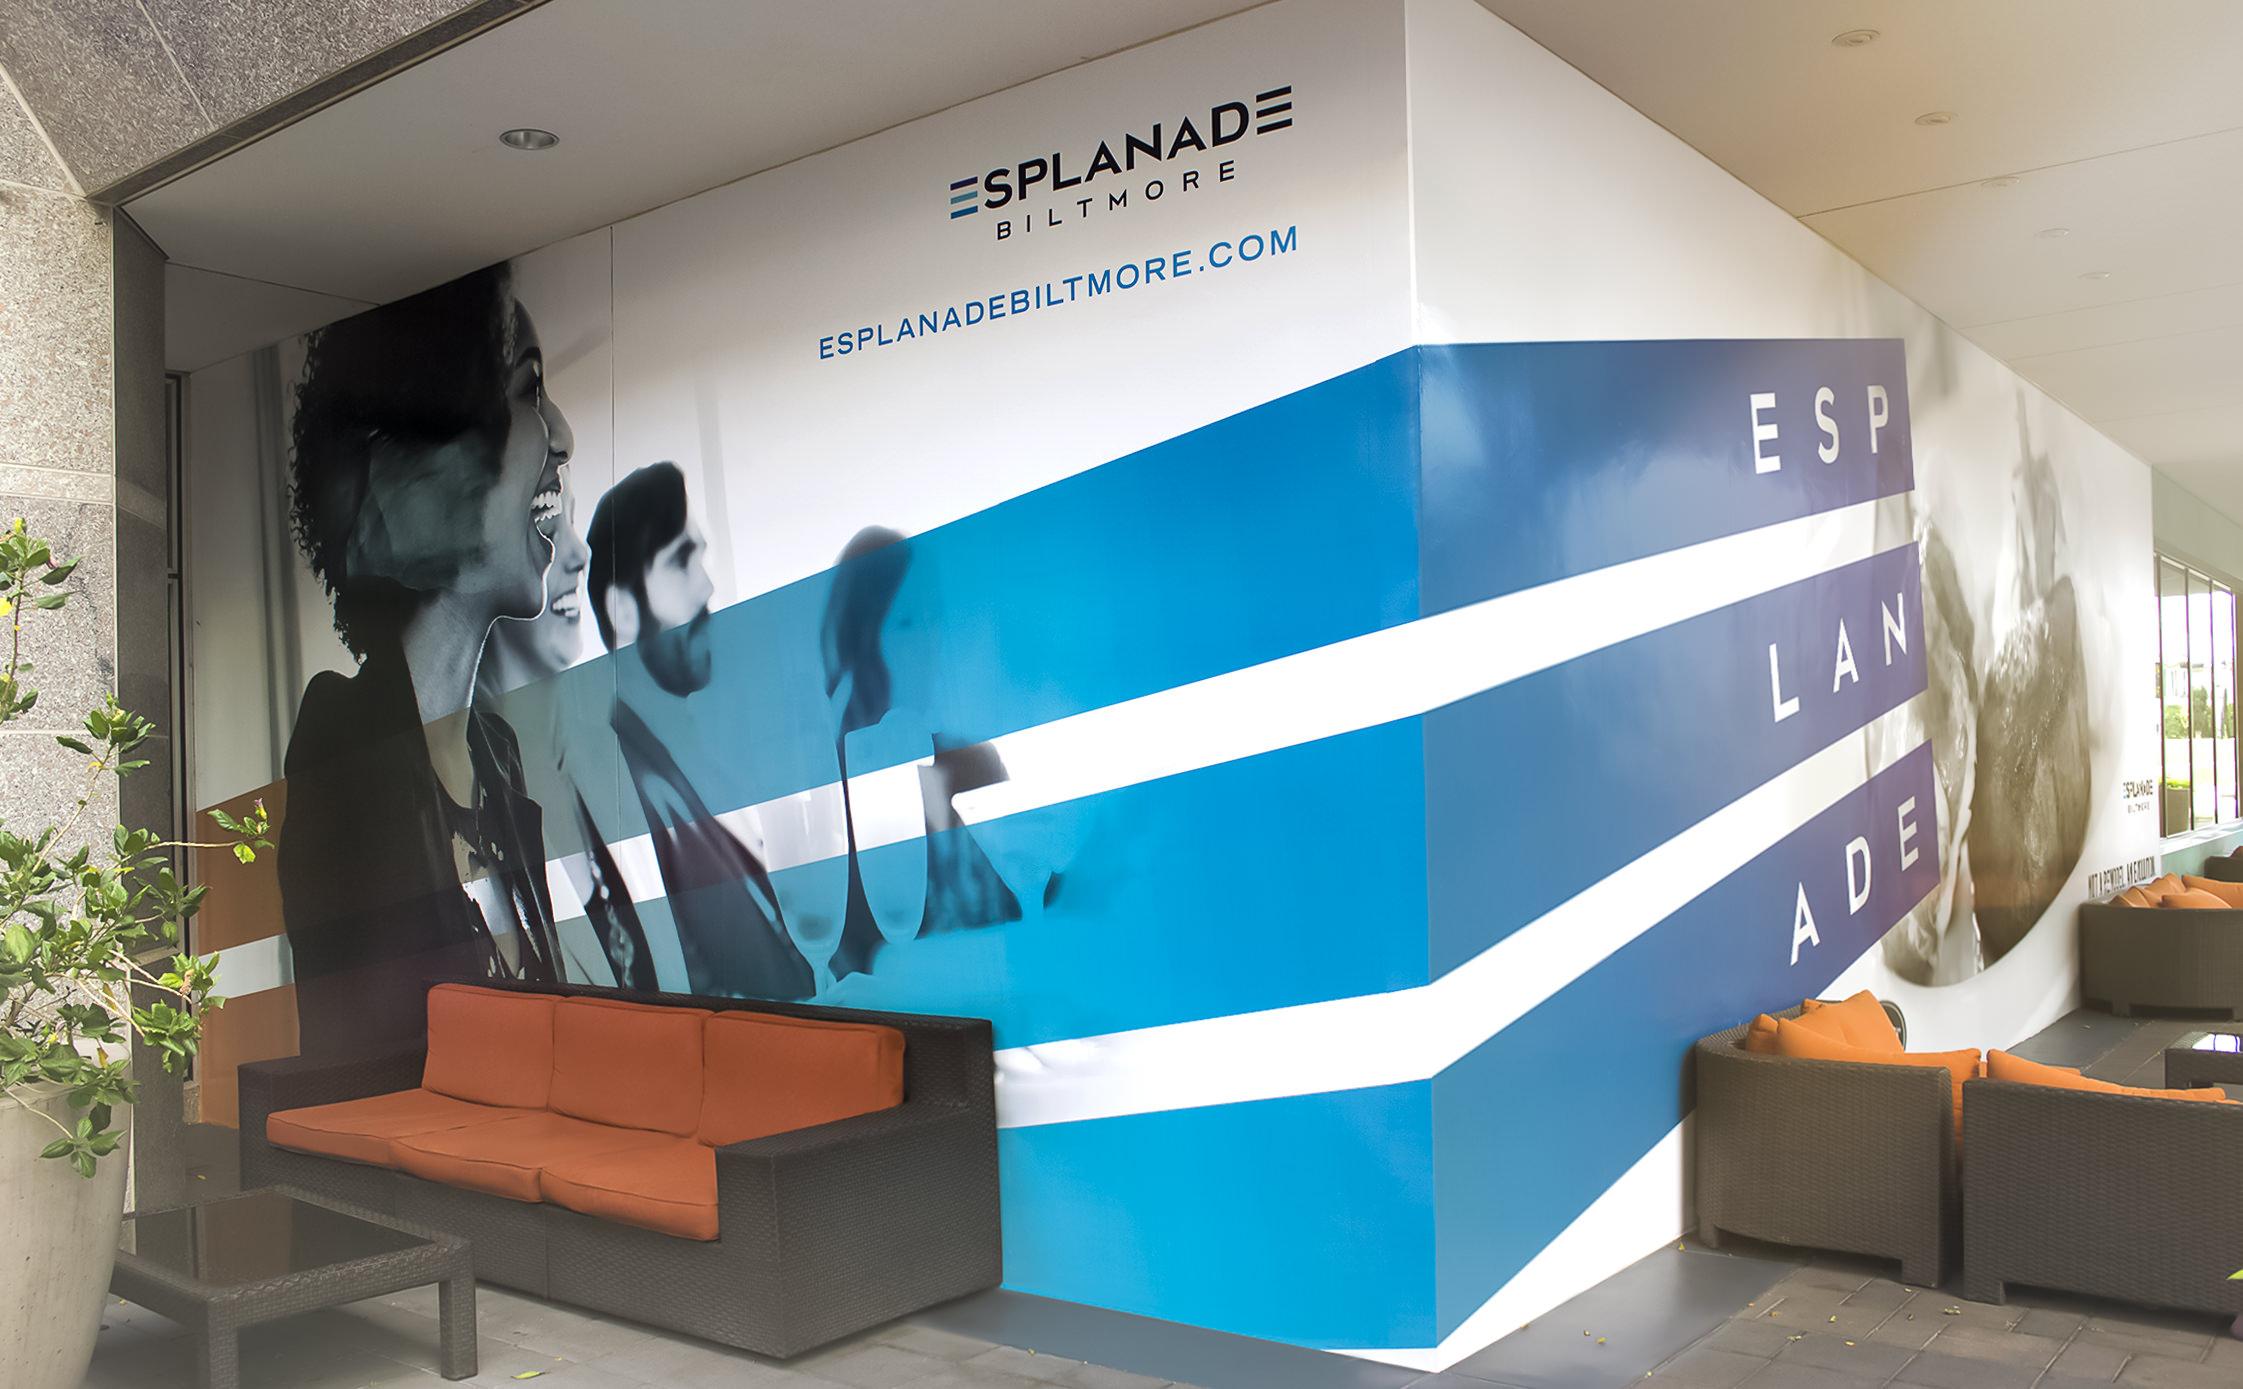 Full color, large format digital graphics wrap the retail corner.